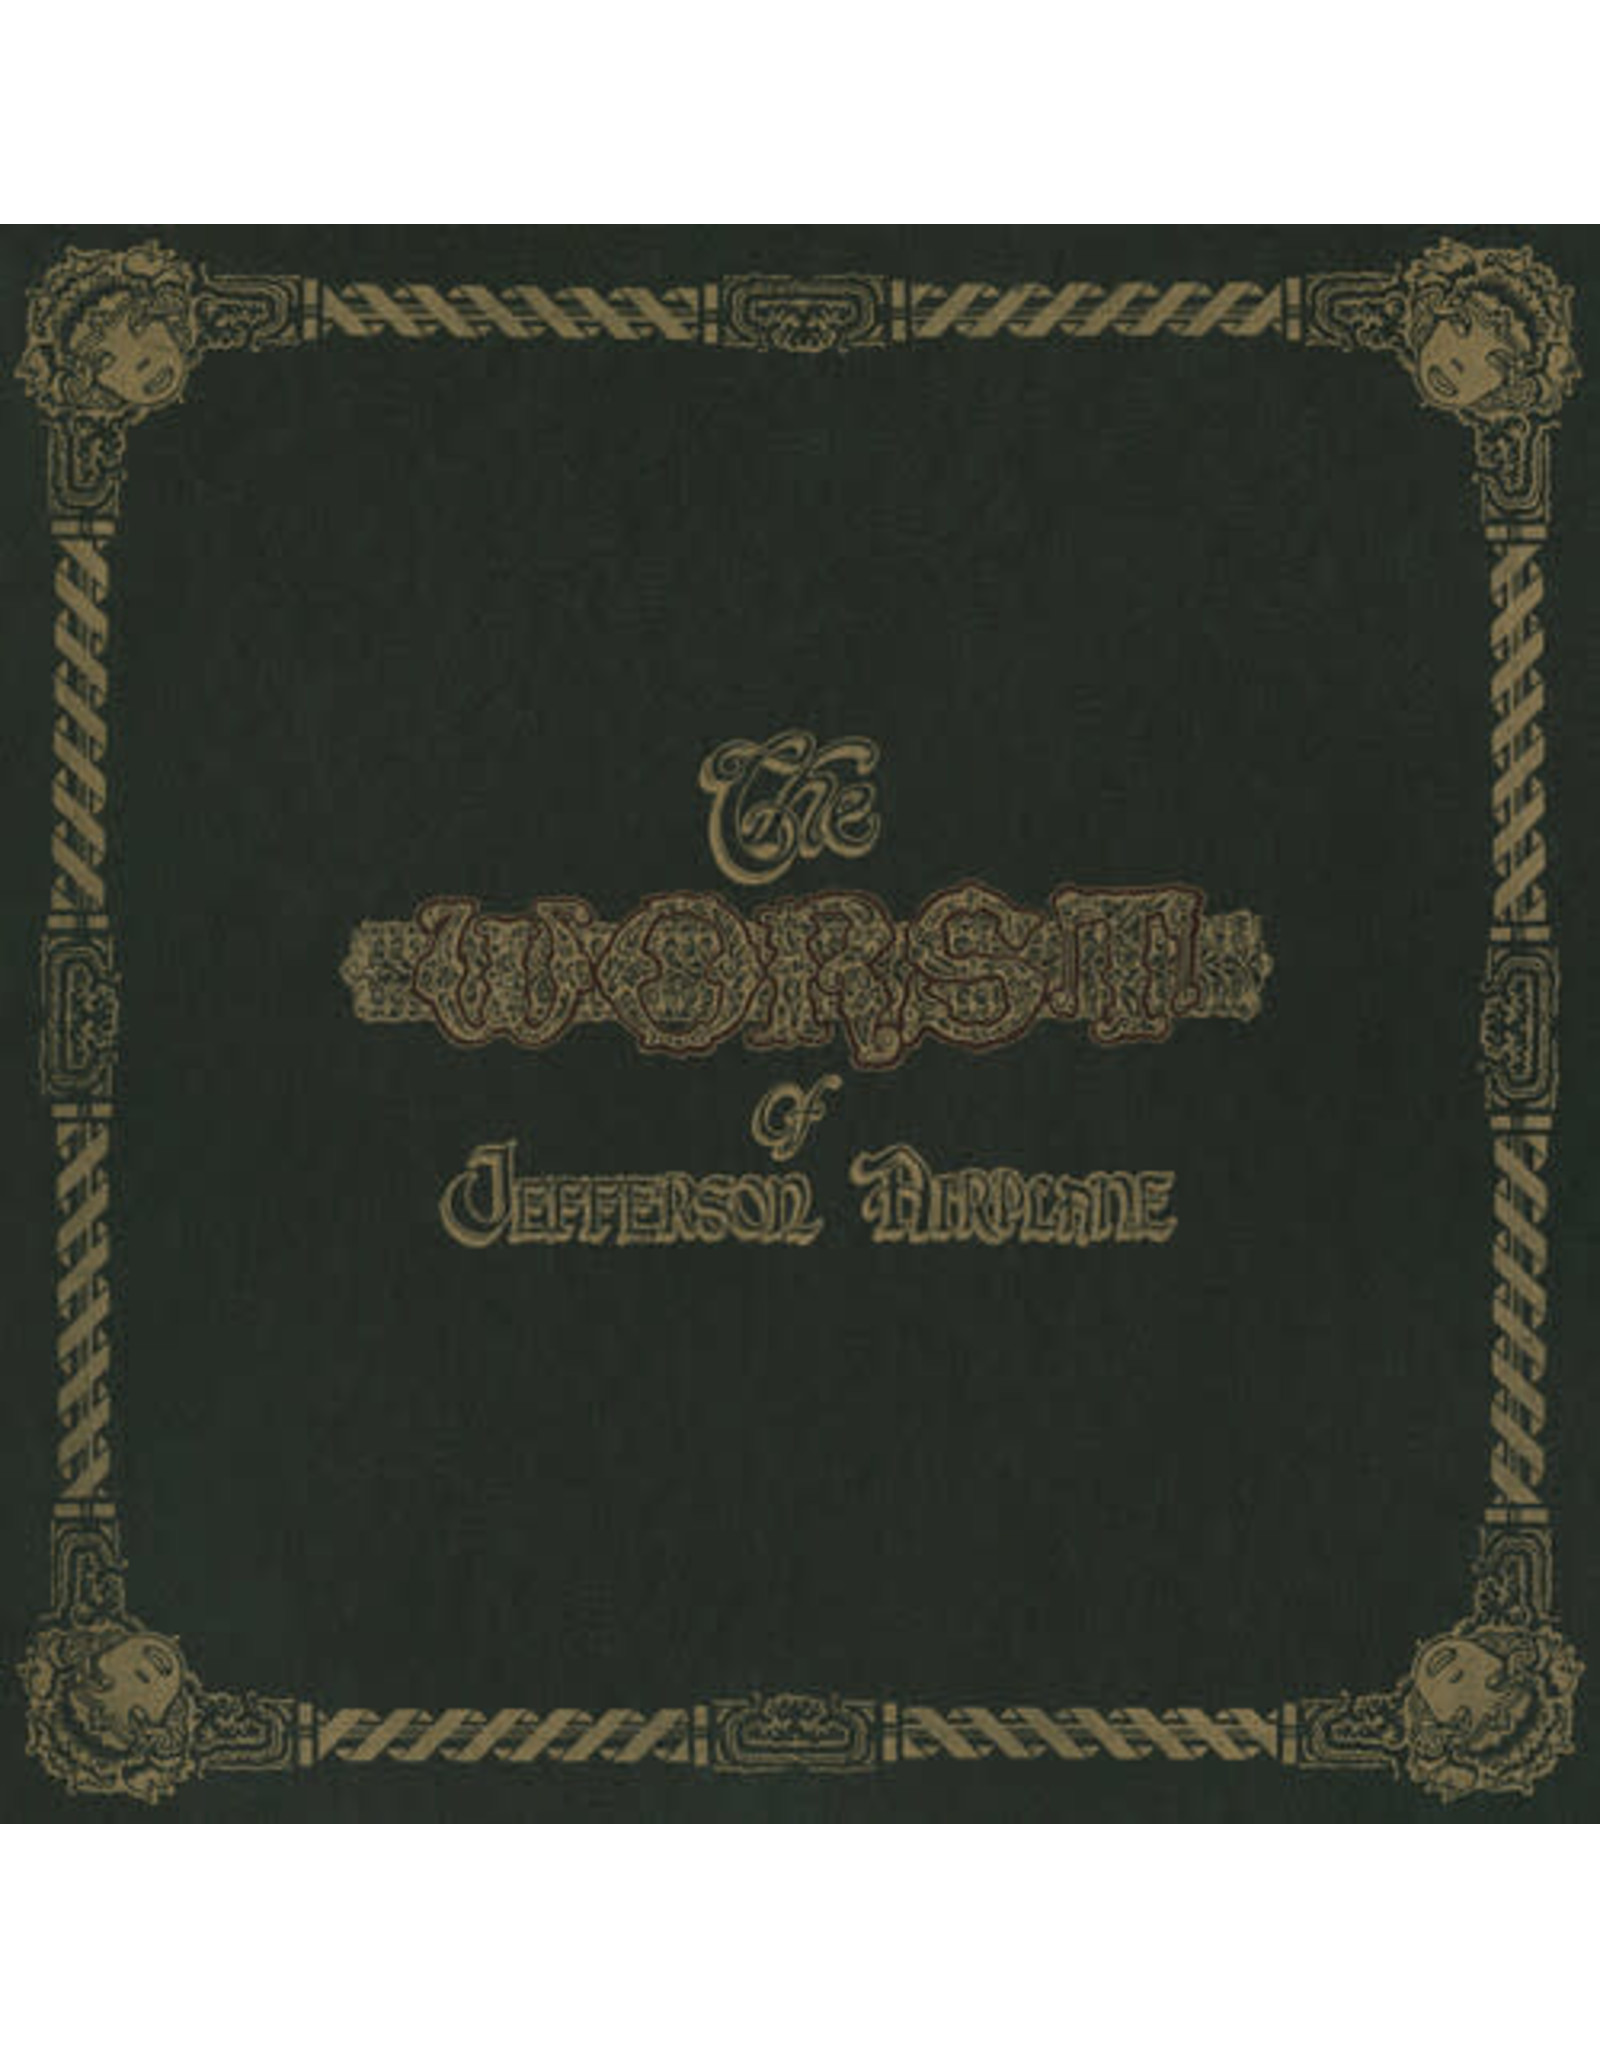 New Vinyl Jefferson Airplane - The Worst Of Jefferson Airplane LP